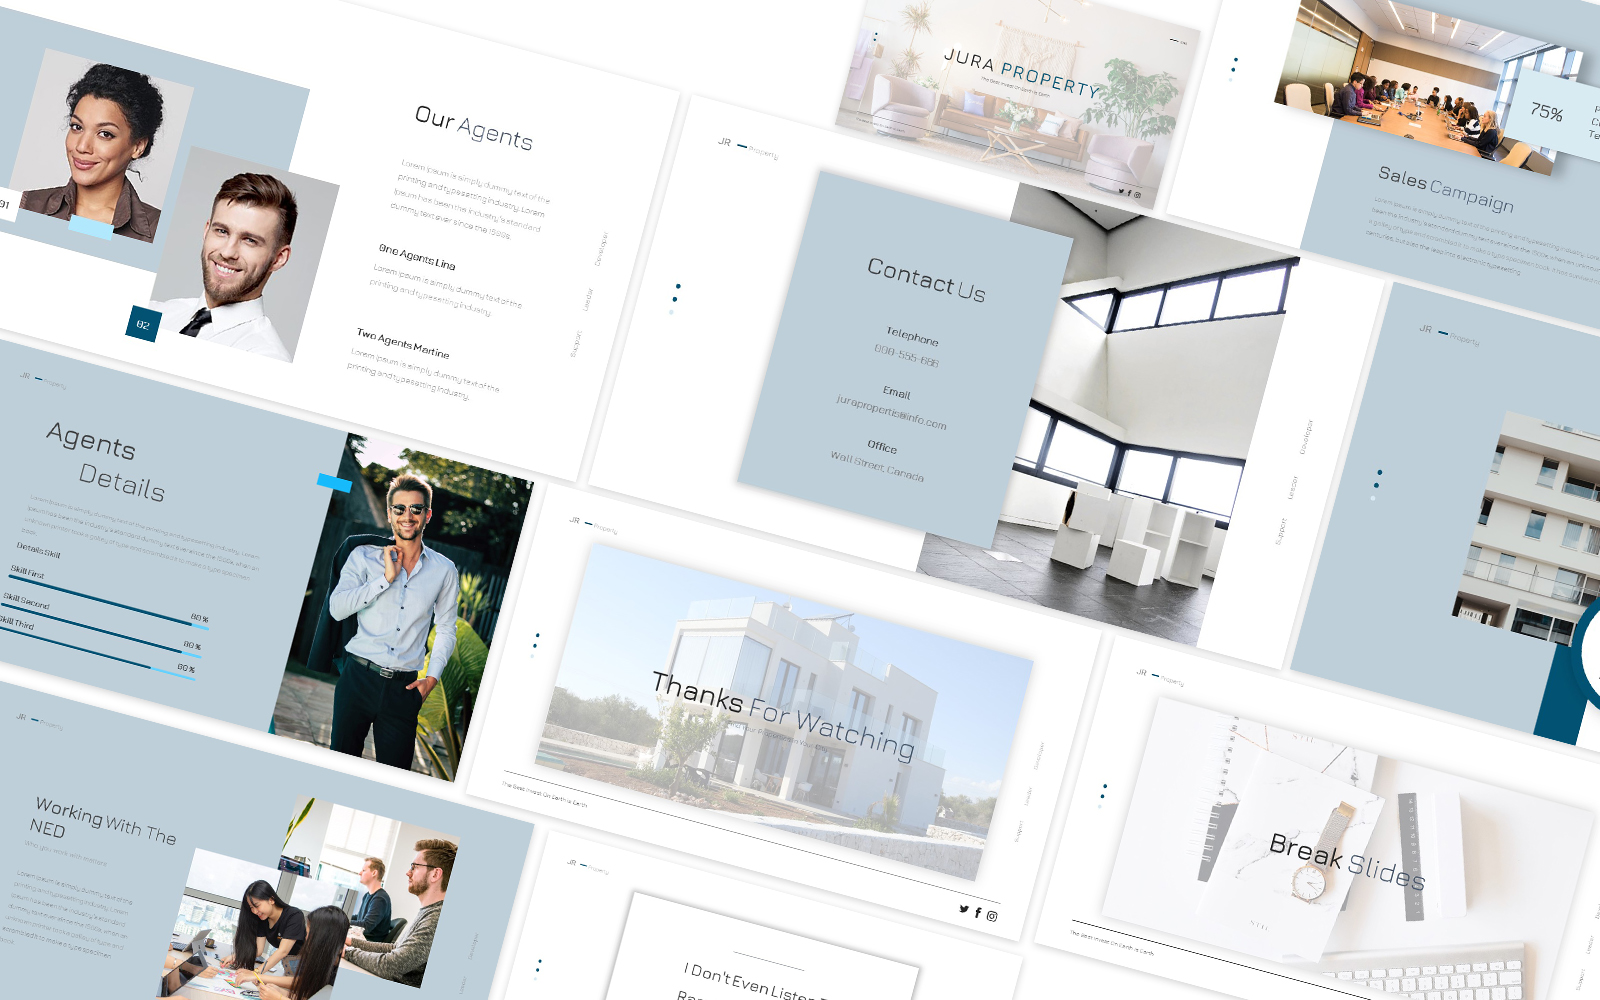 Jura Property Powerpoint Template